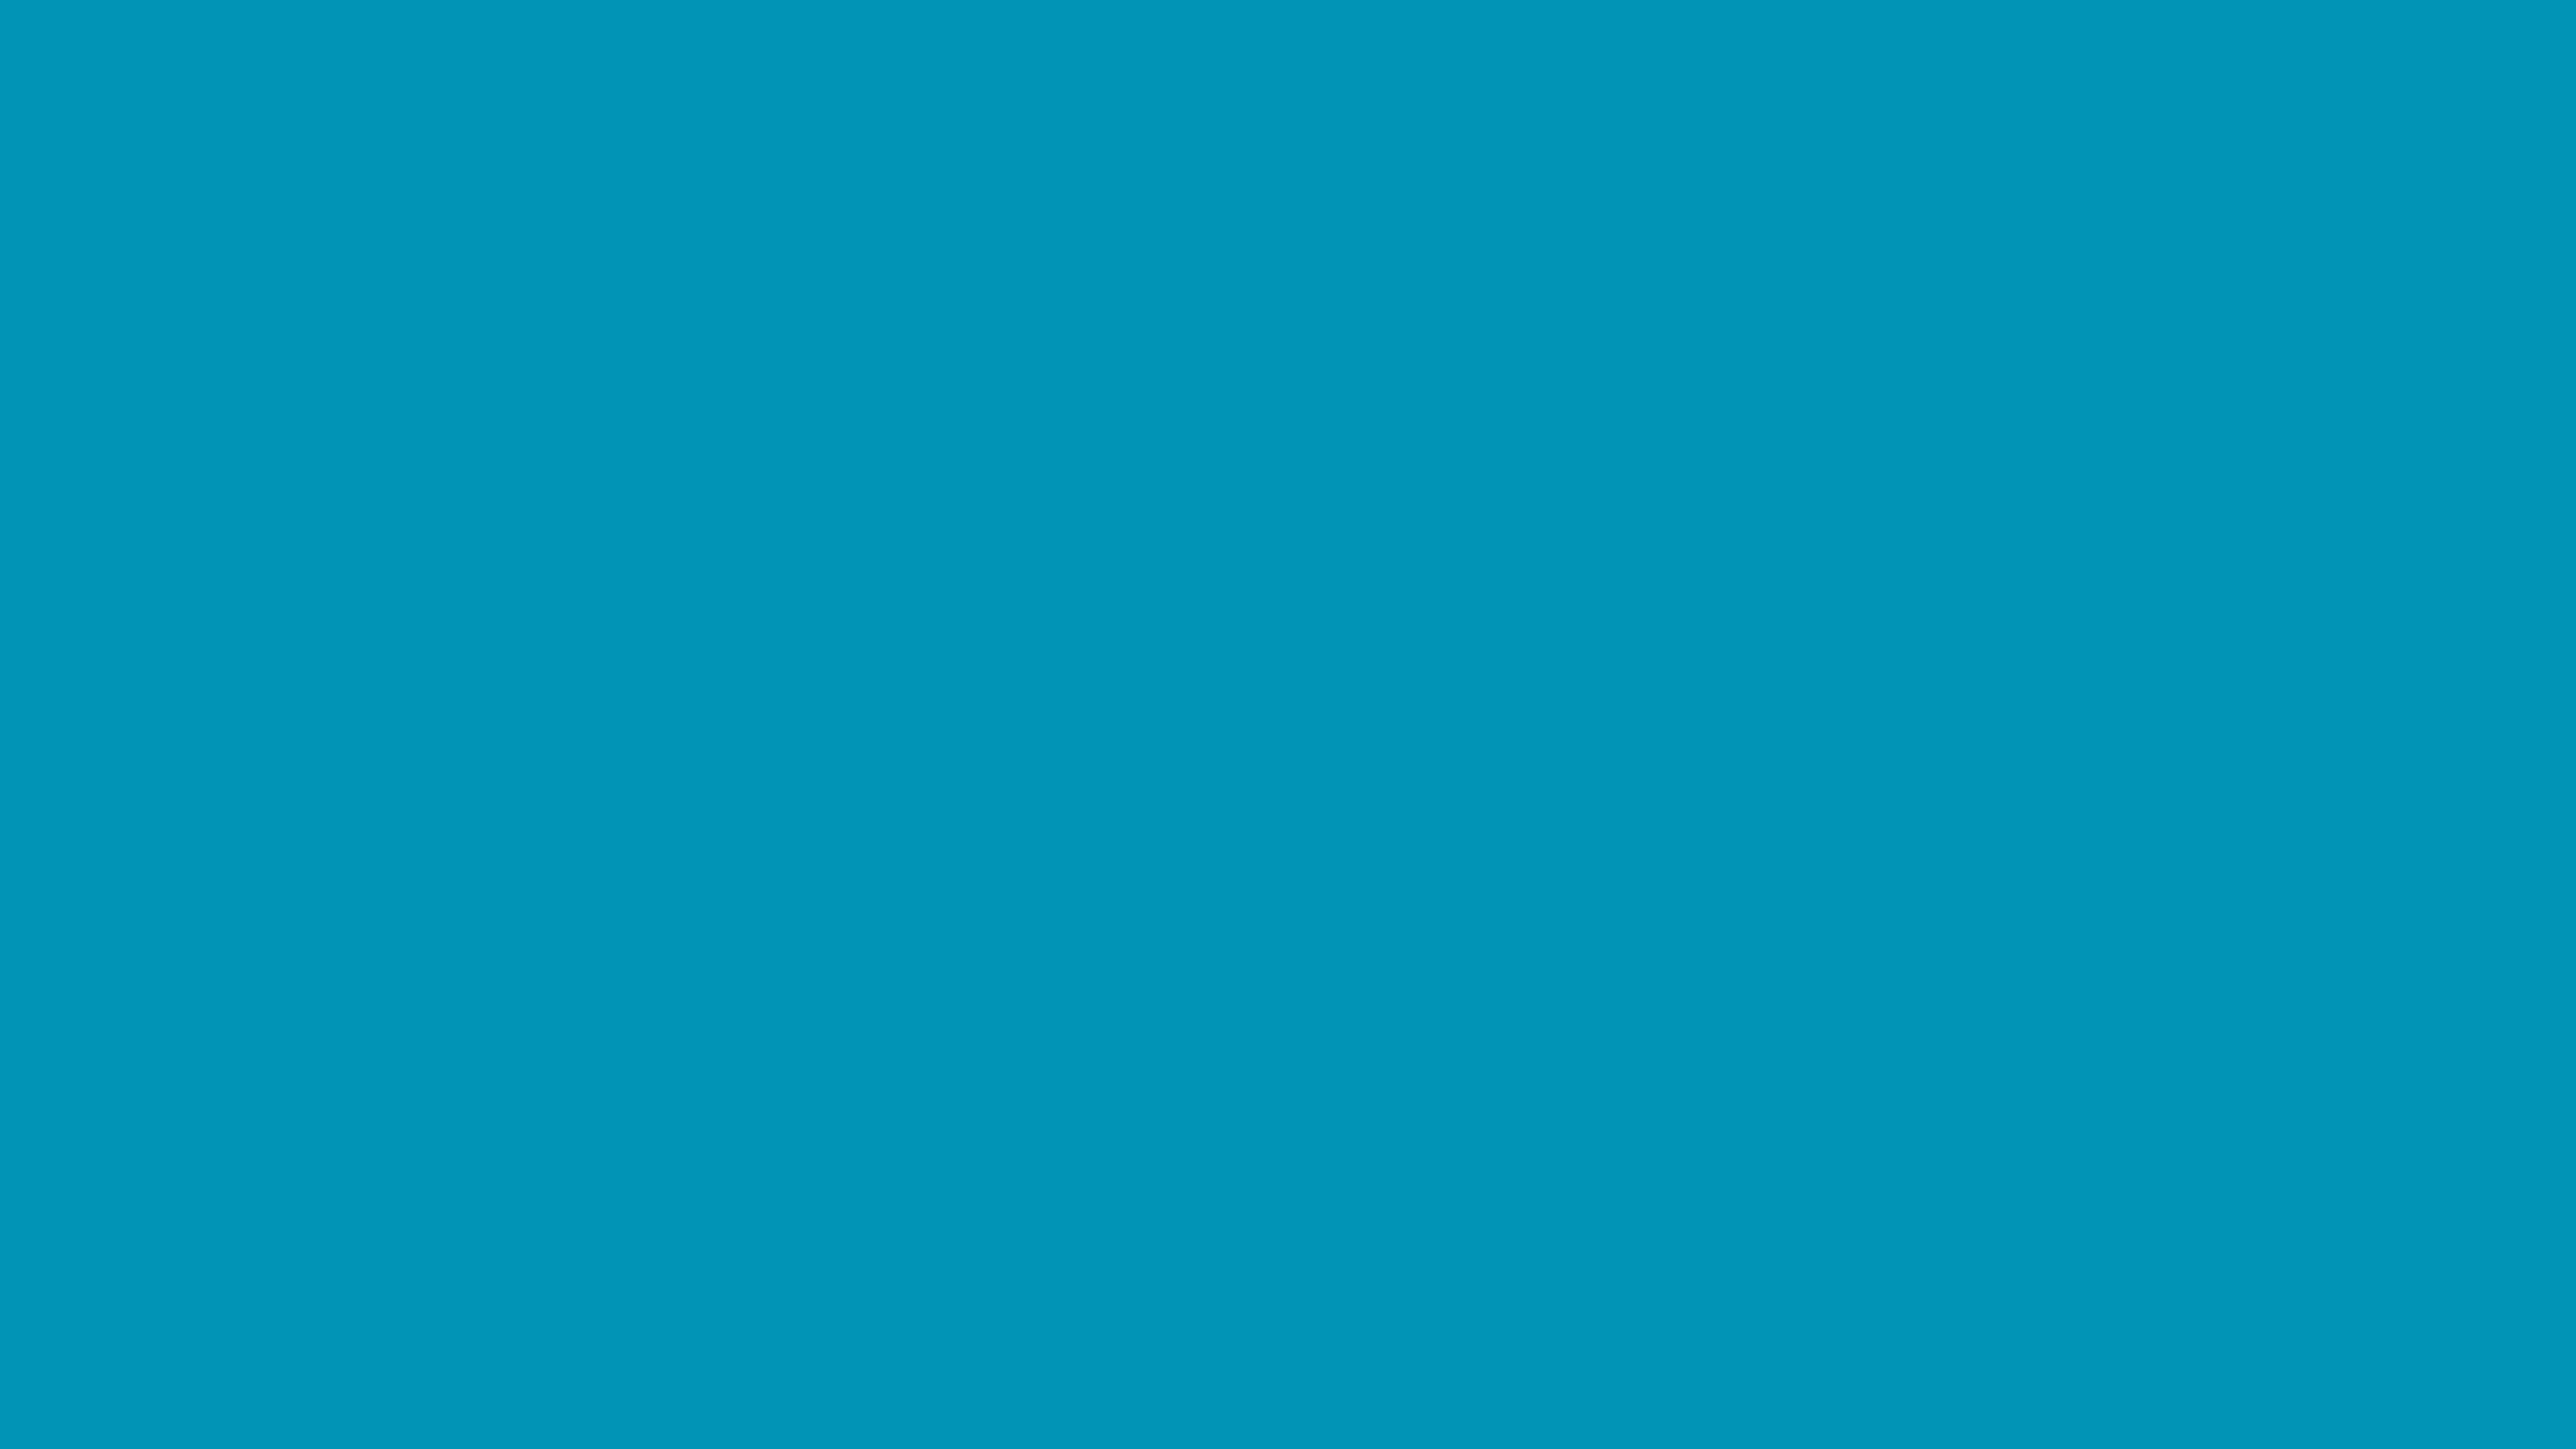 7680x4320 Bondi Blue Solid Color Background